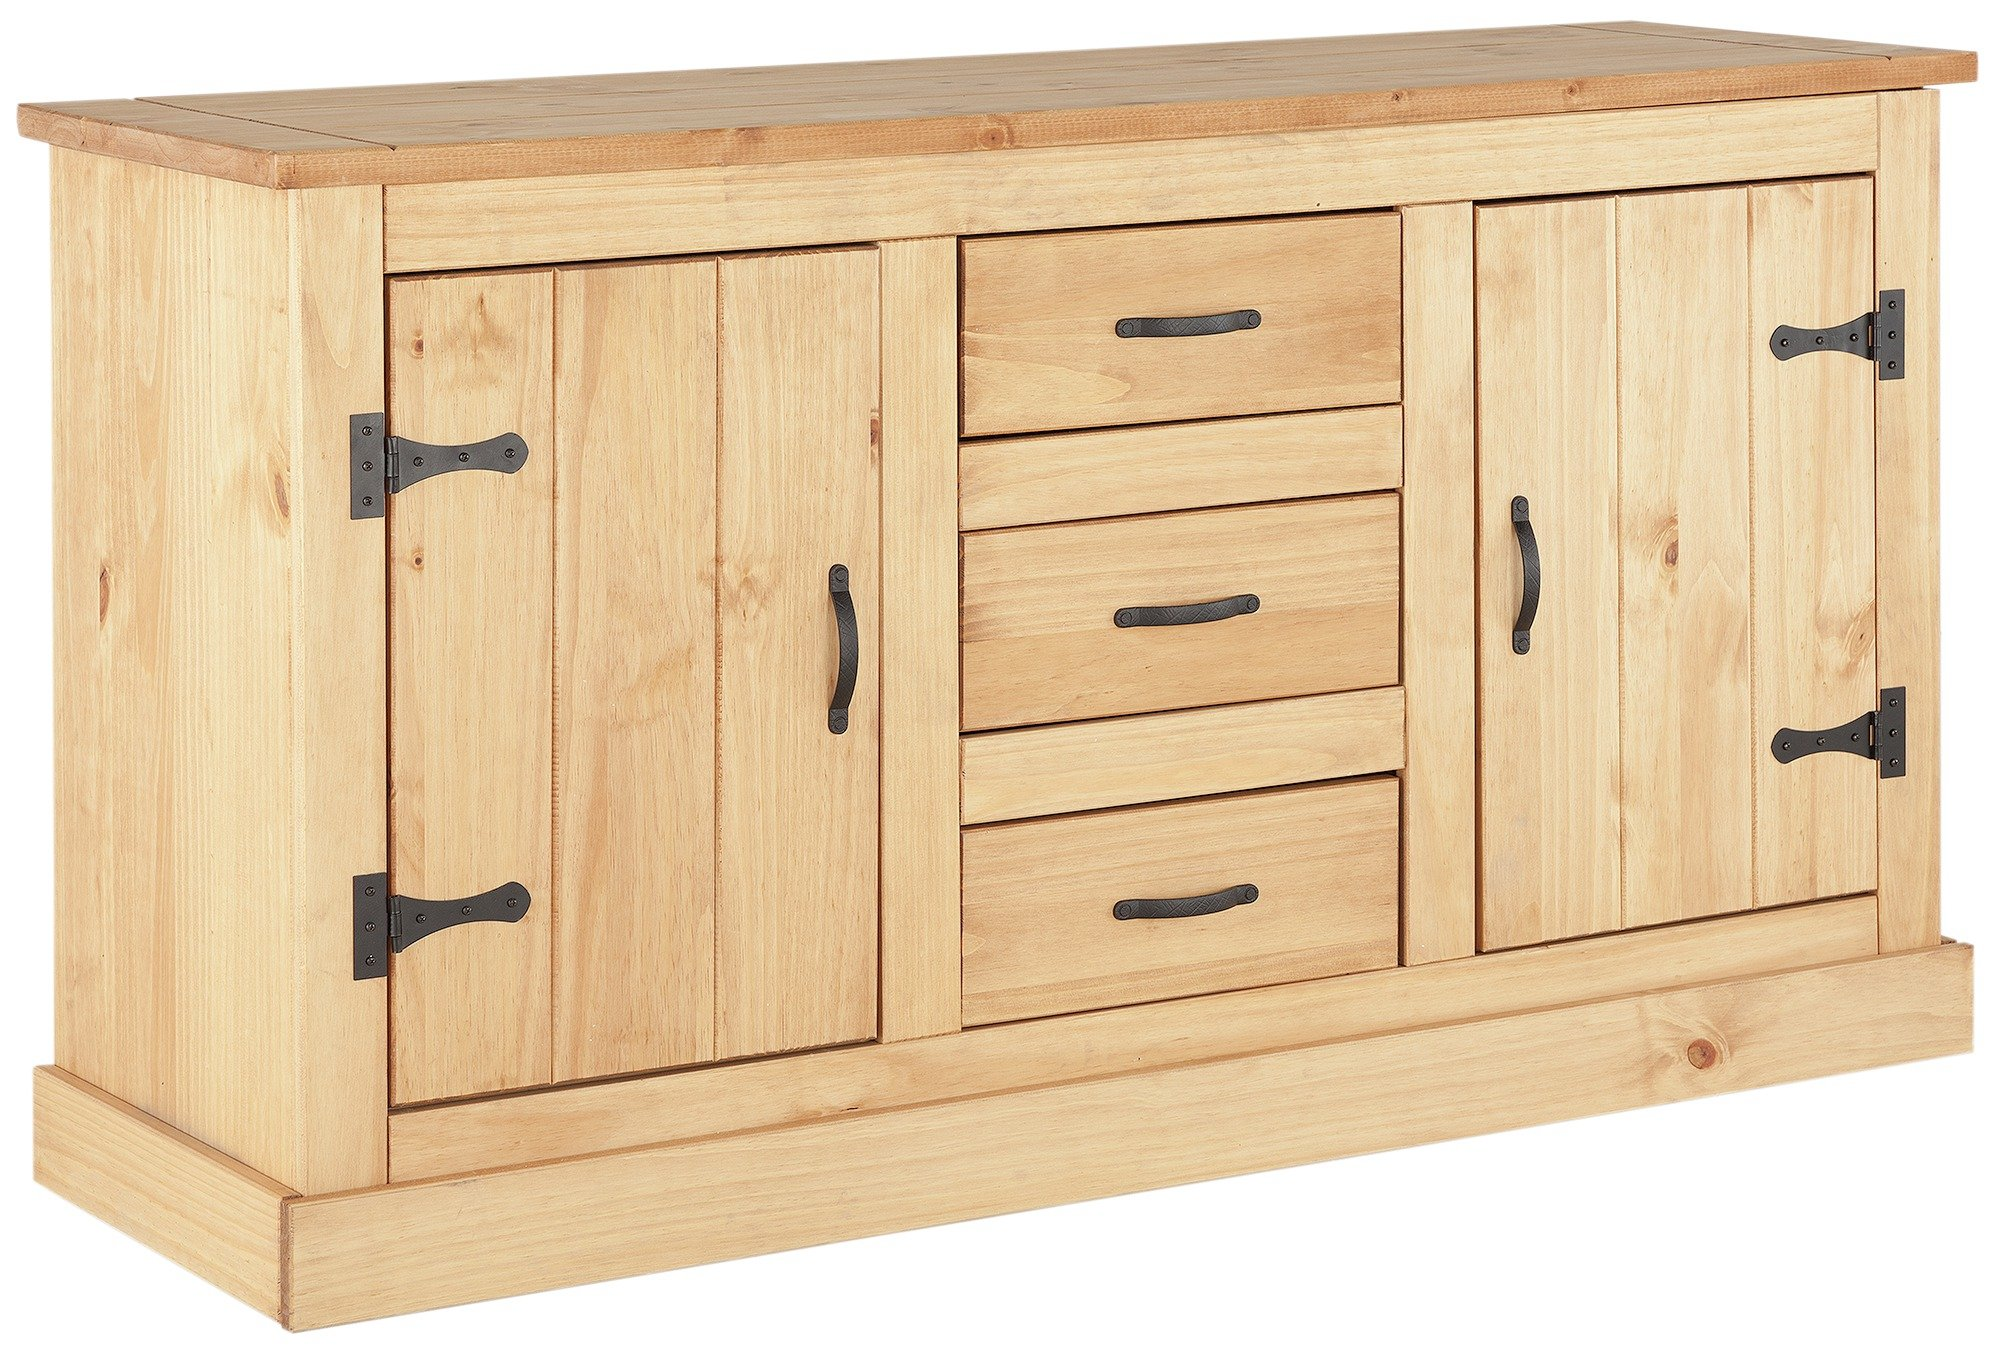 Argos Home San Diego 2 Door 3 Drawer Solid Pine Sideboard